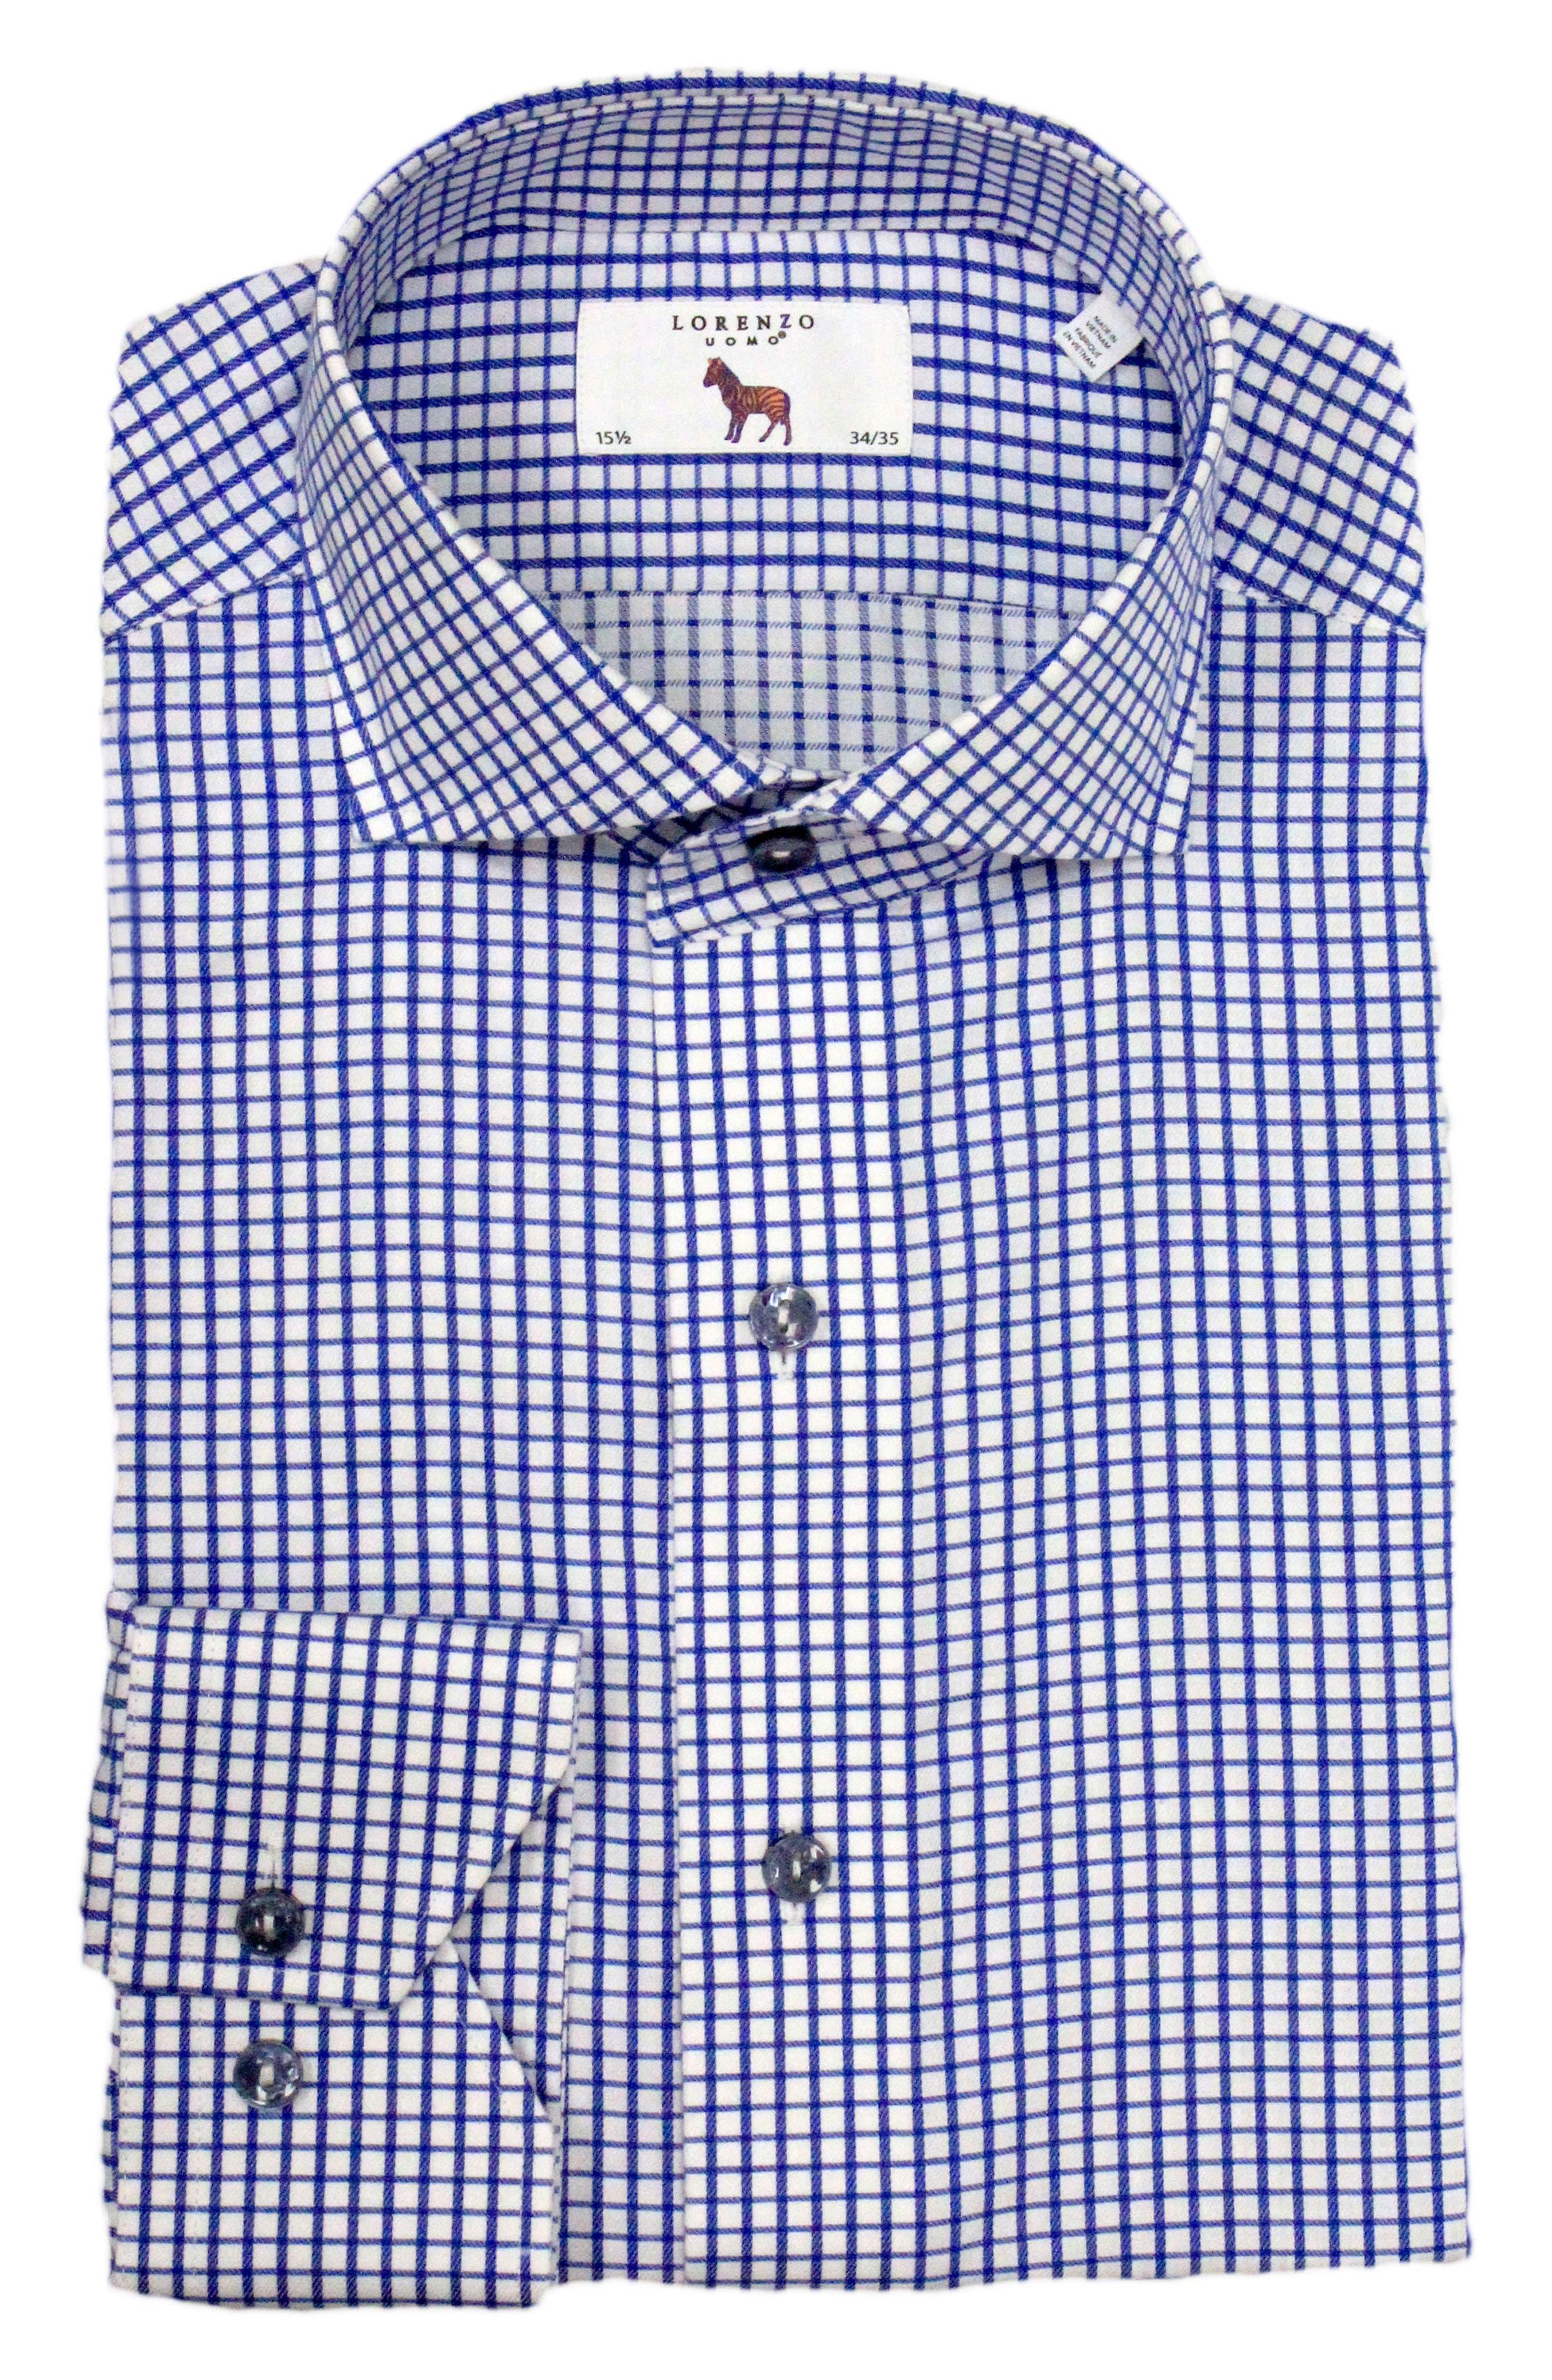 Trim Fit Check Dress Shirt,                             Main thumbnail 1, color,                             Navy/ White